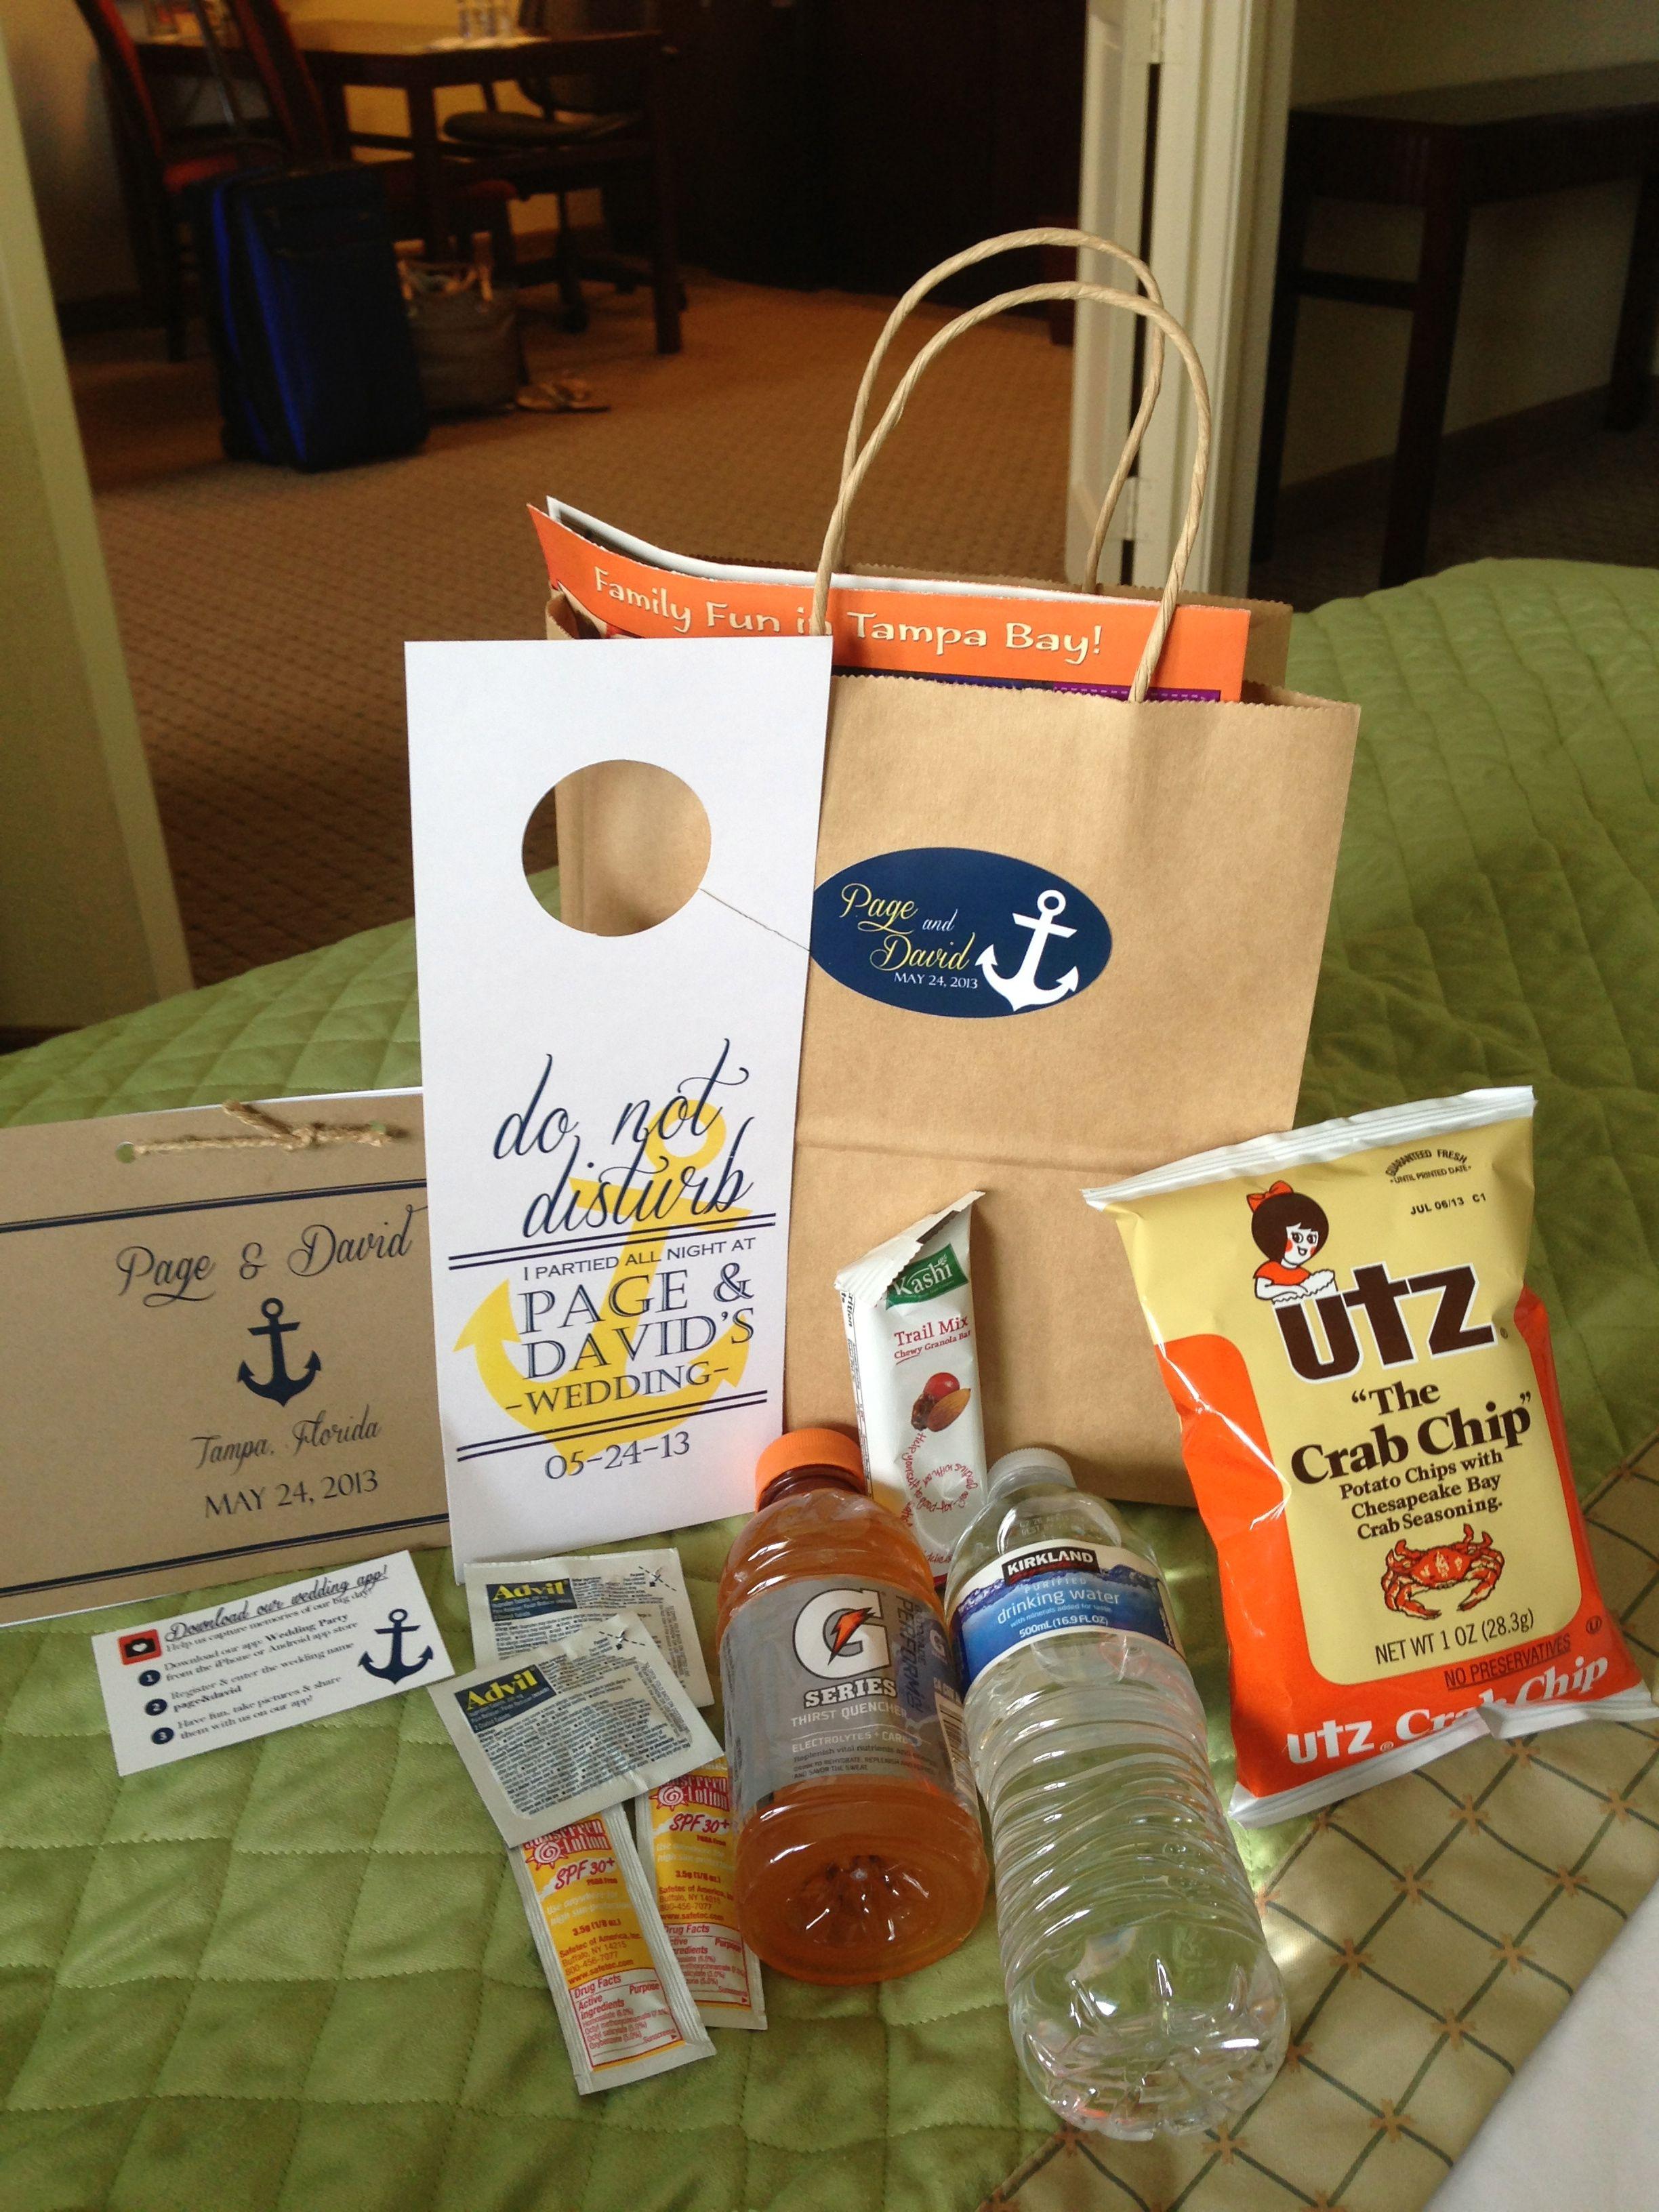 Cruise Wedding Gift Bag Ideas : wedding gift bags wedding favors wedding stuff wedding ideas cruise ...